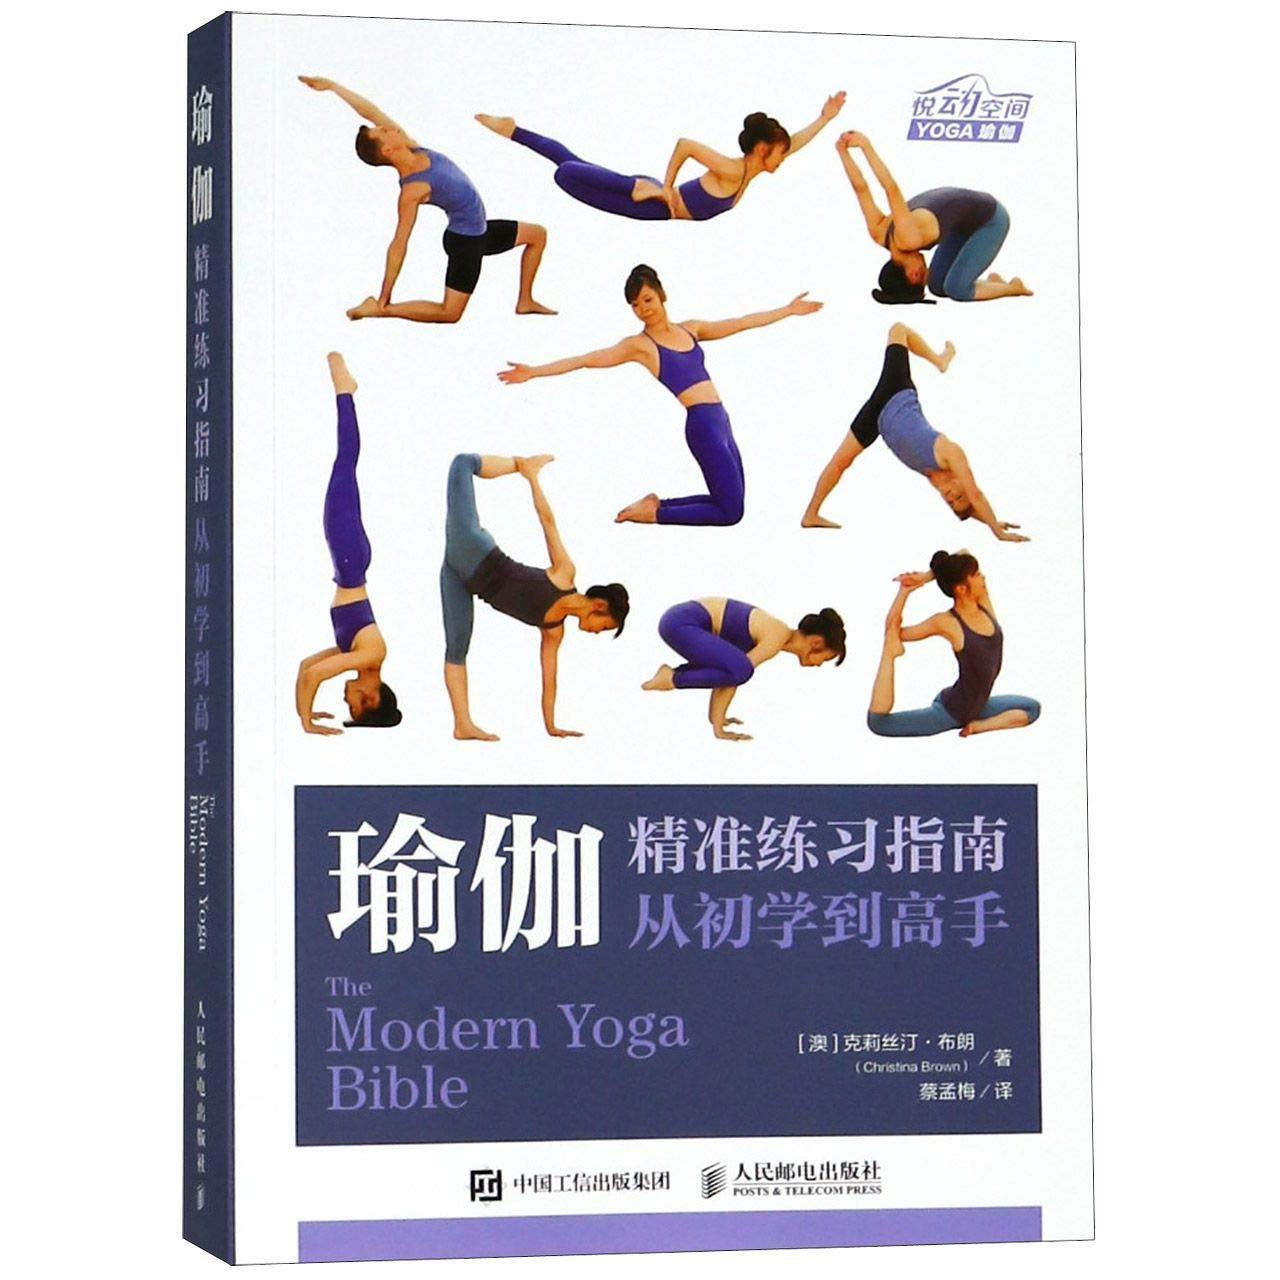 The Modern Yoga Bible (Chinese Edition): Christine Brown ...